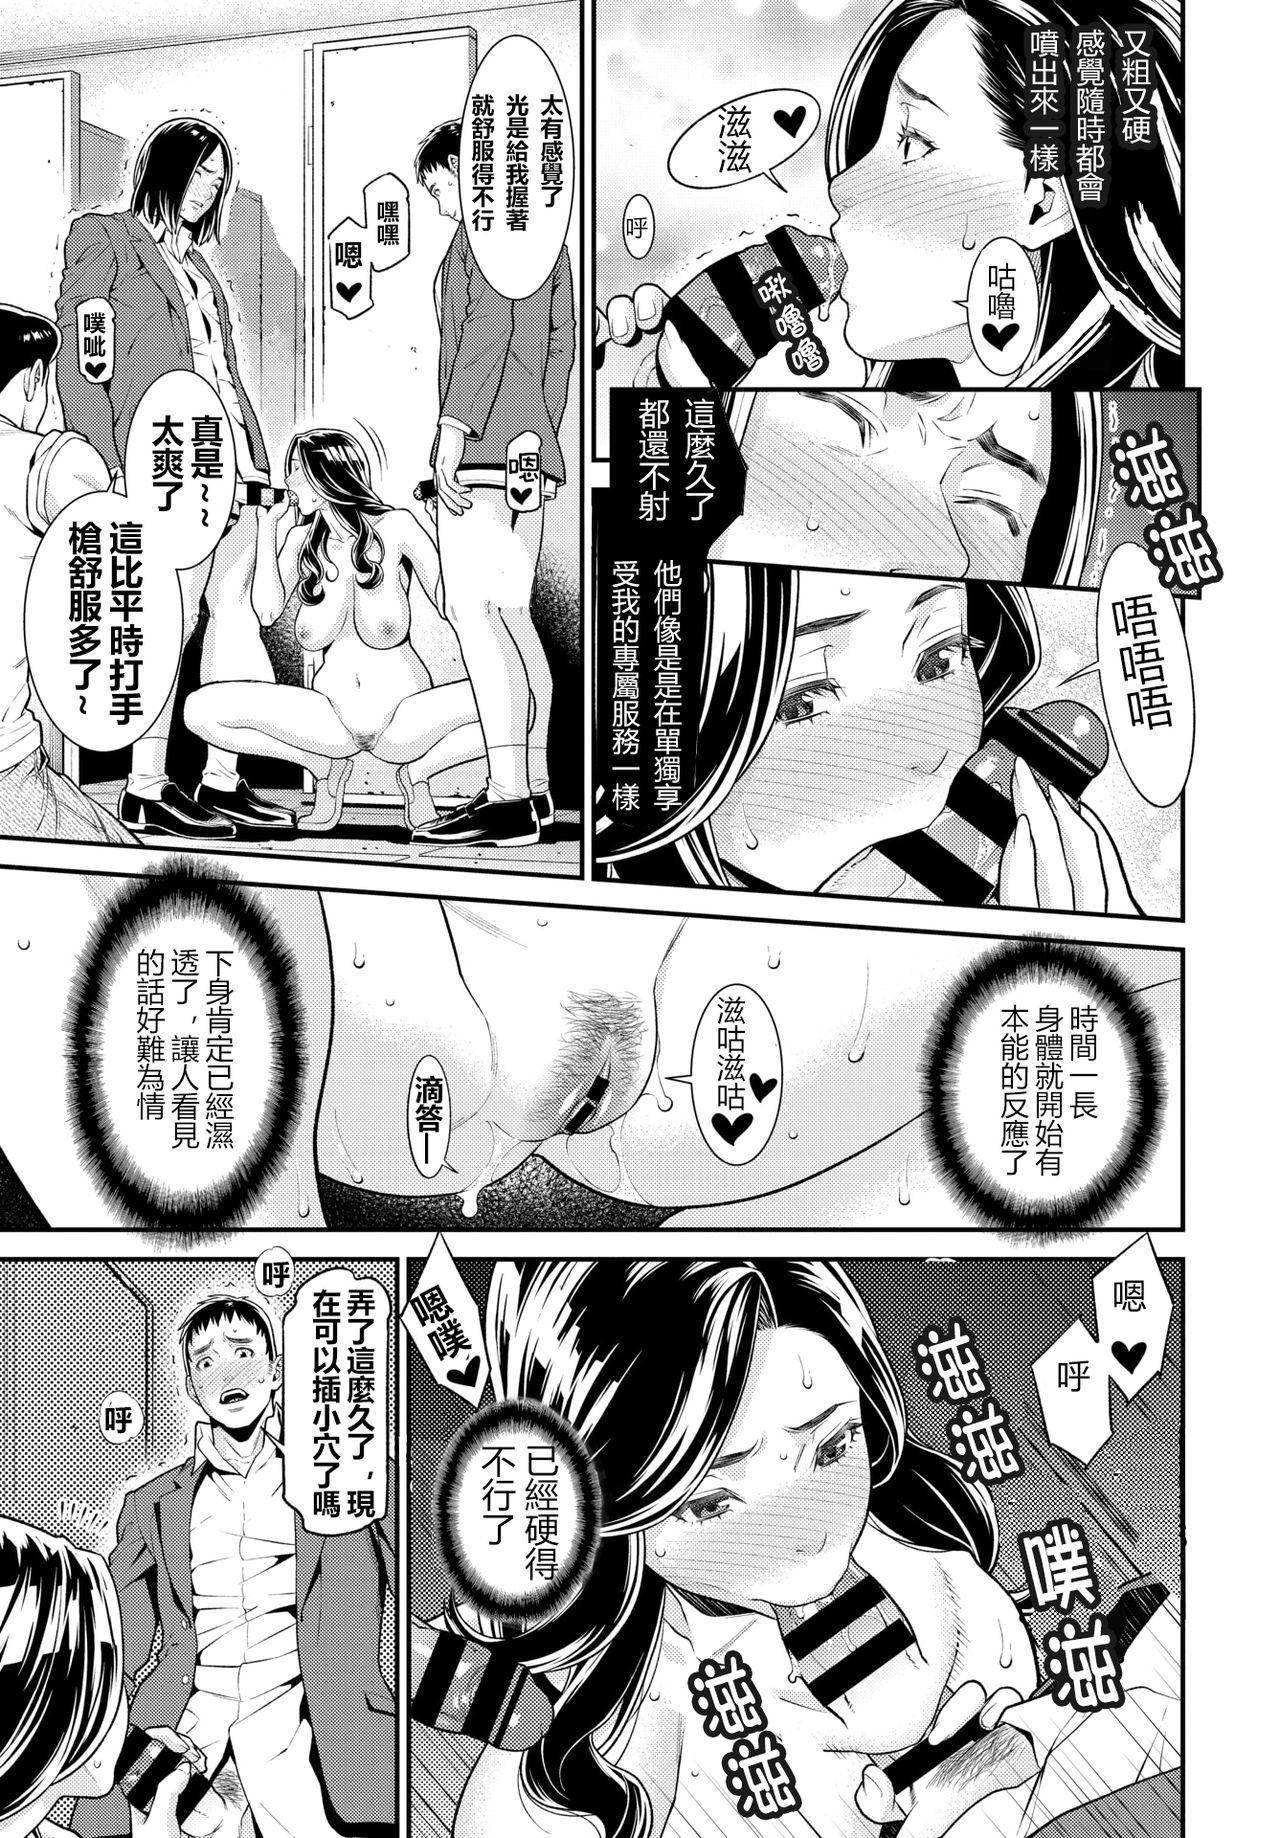 [Syuuen] Secret Wife  1-6 [Chinese][鼠灣漢化](210206最新修复完整版)【極品人妻NTR】 29